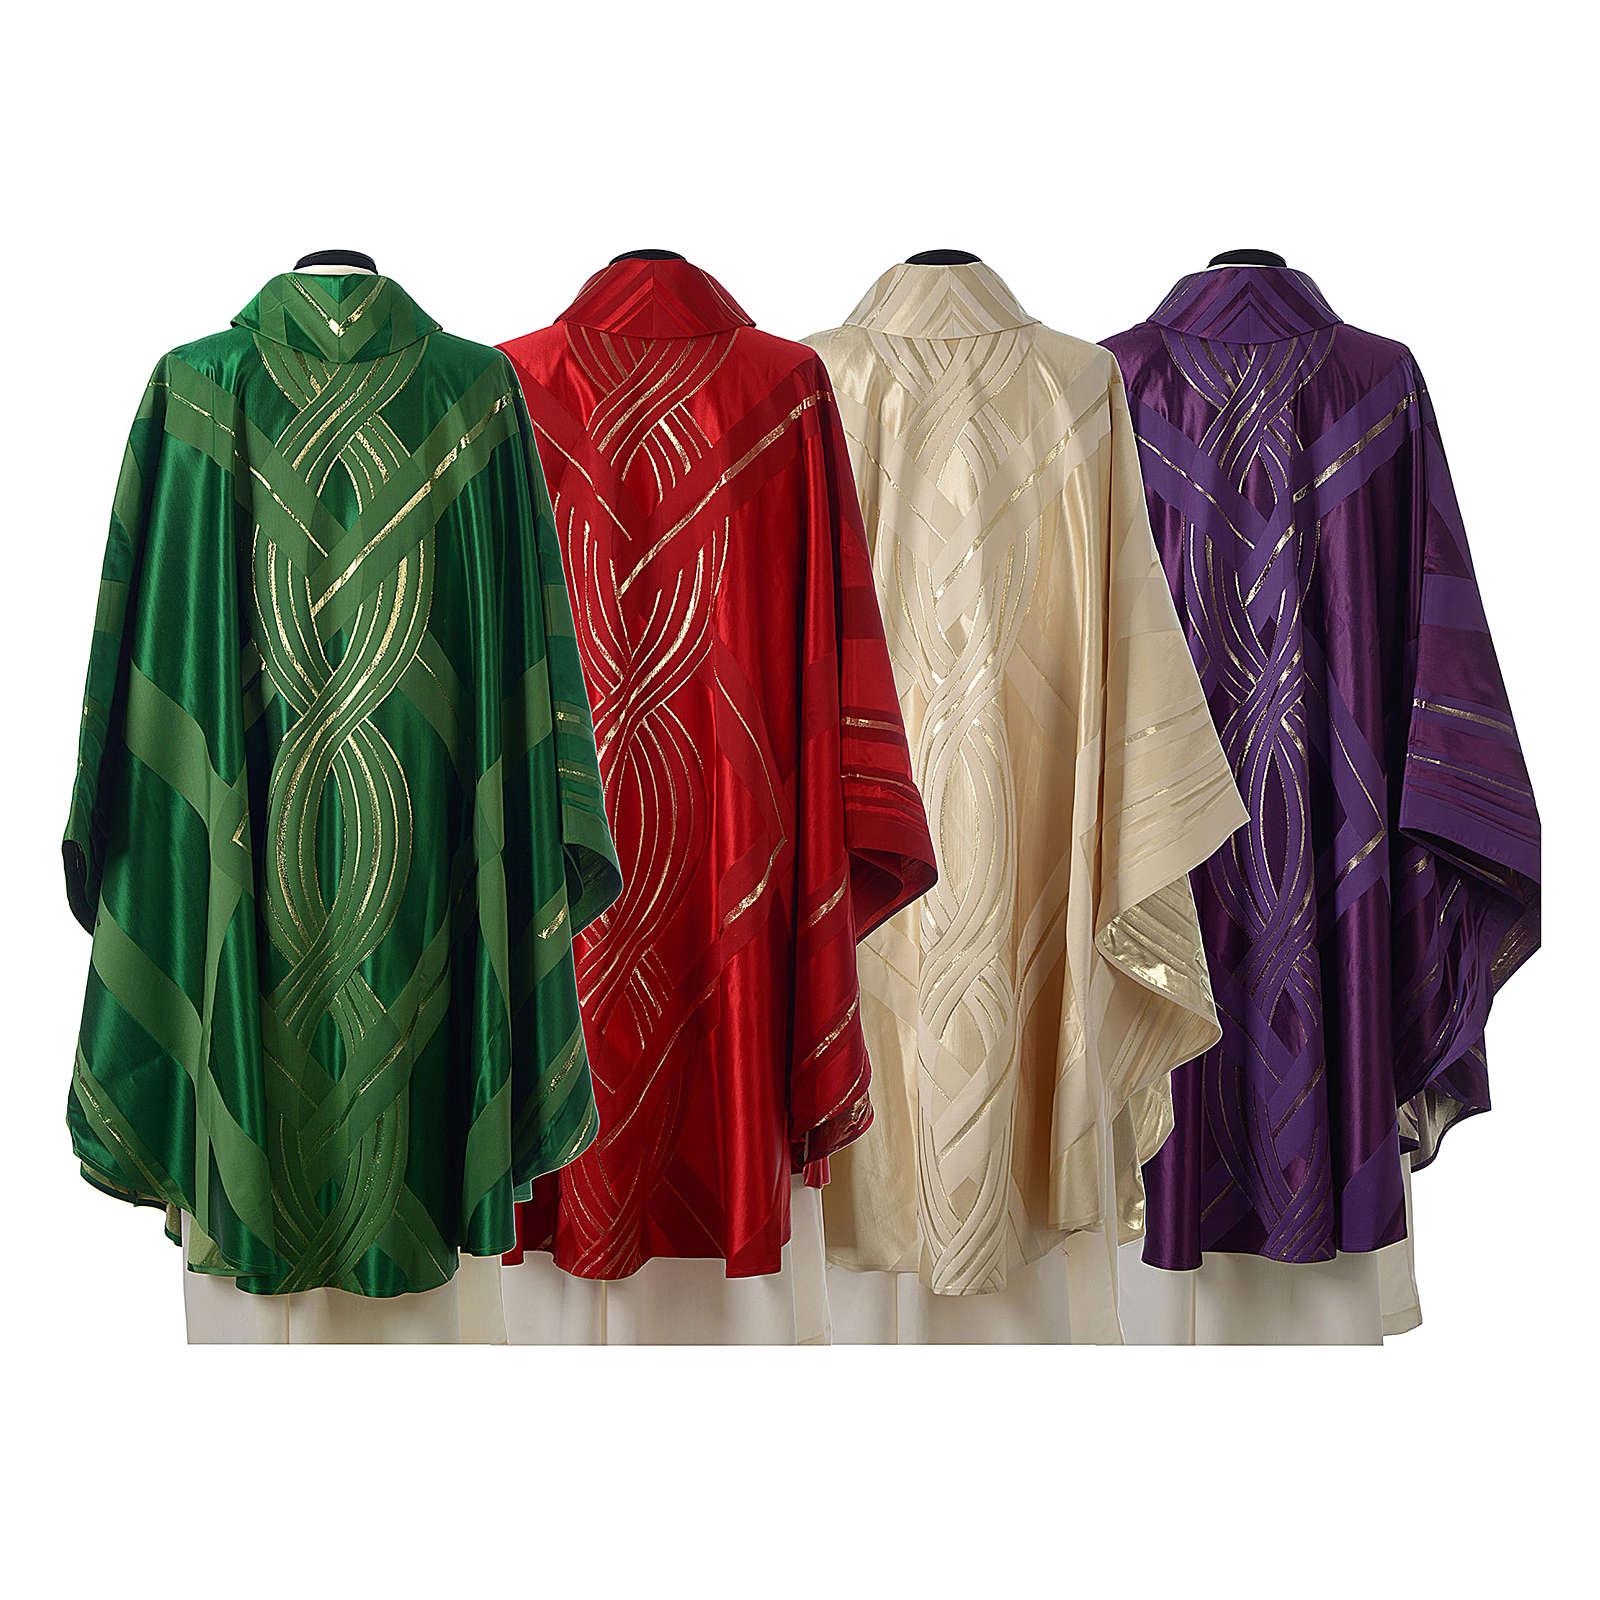 Casula lana seta lurex intreccio 4